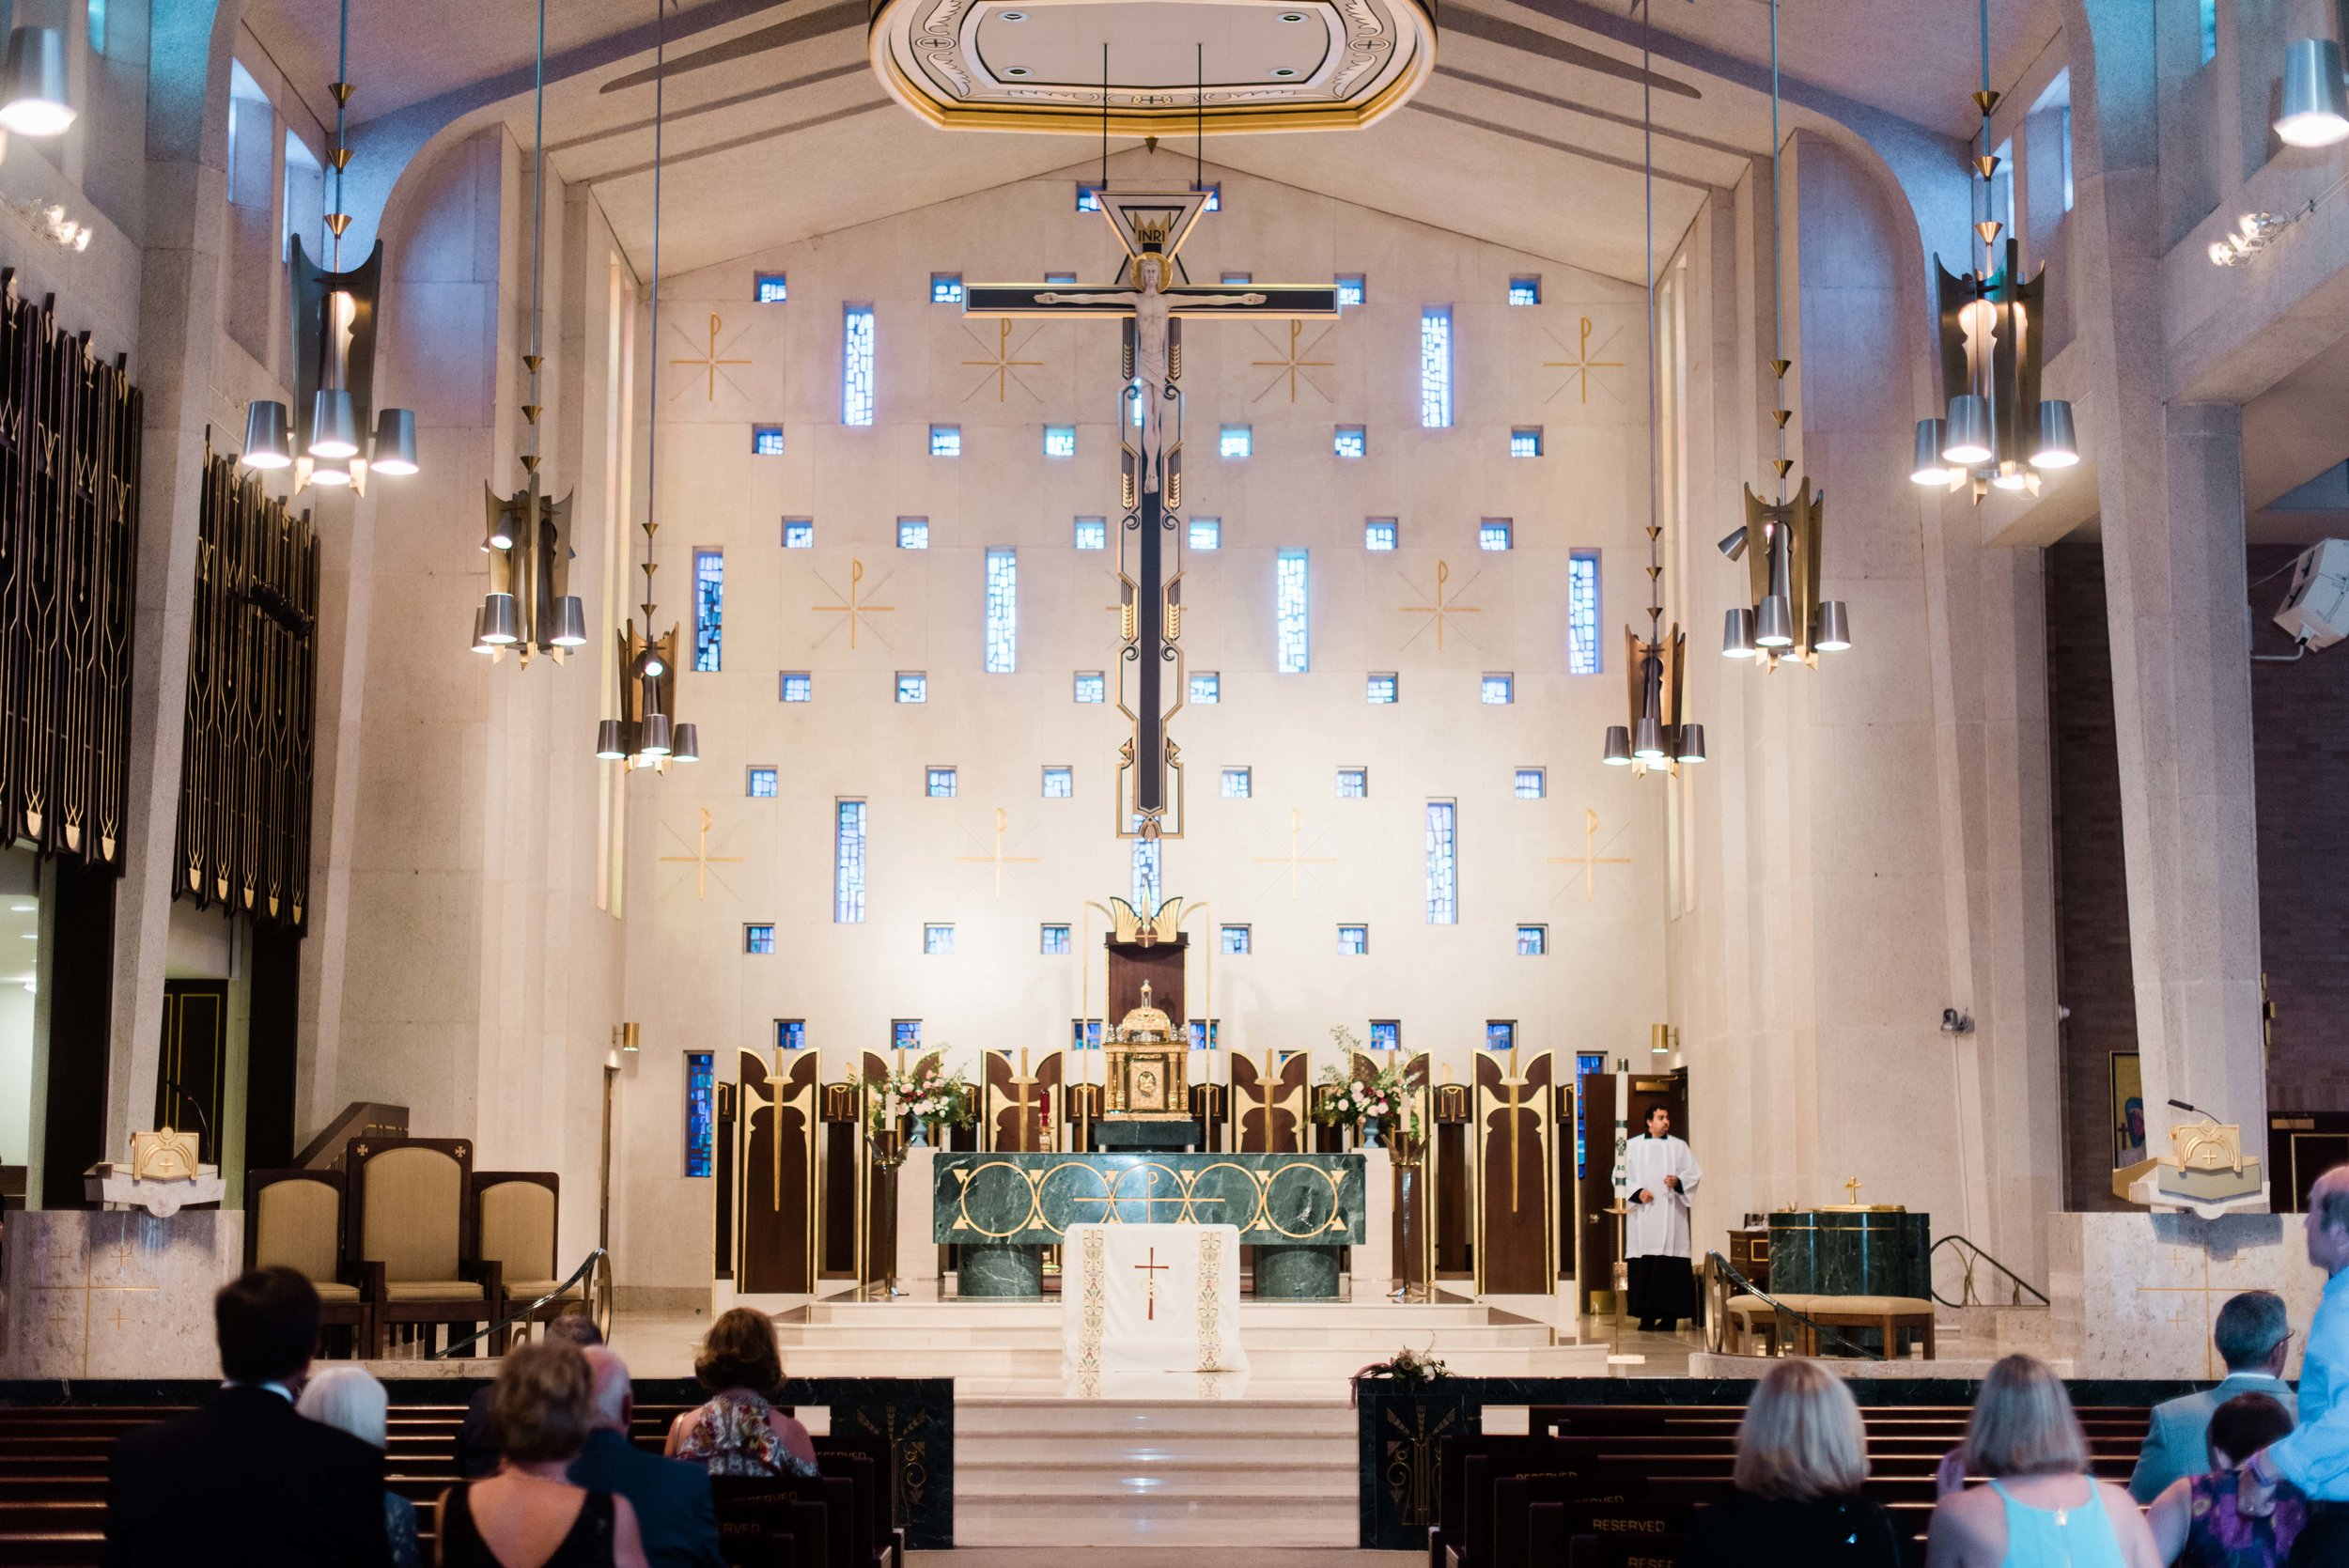 St-Michaels-Catholic-Church-Houston-Wedding-Ceremony-Josh-Dana-Fernandez-Photographer-Destination-Austin-Dallas-Fine-Art-Film-1.jpg